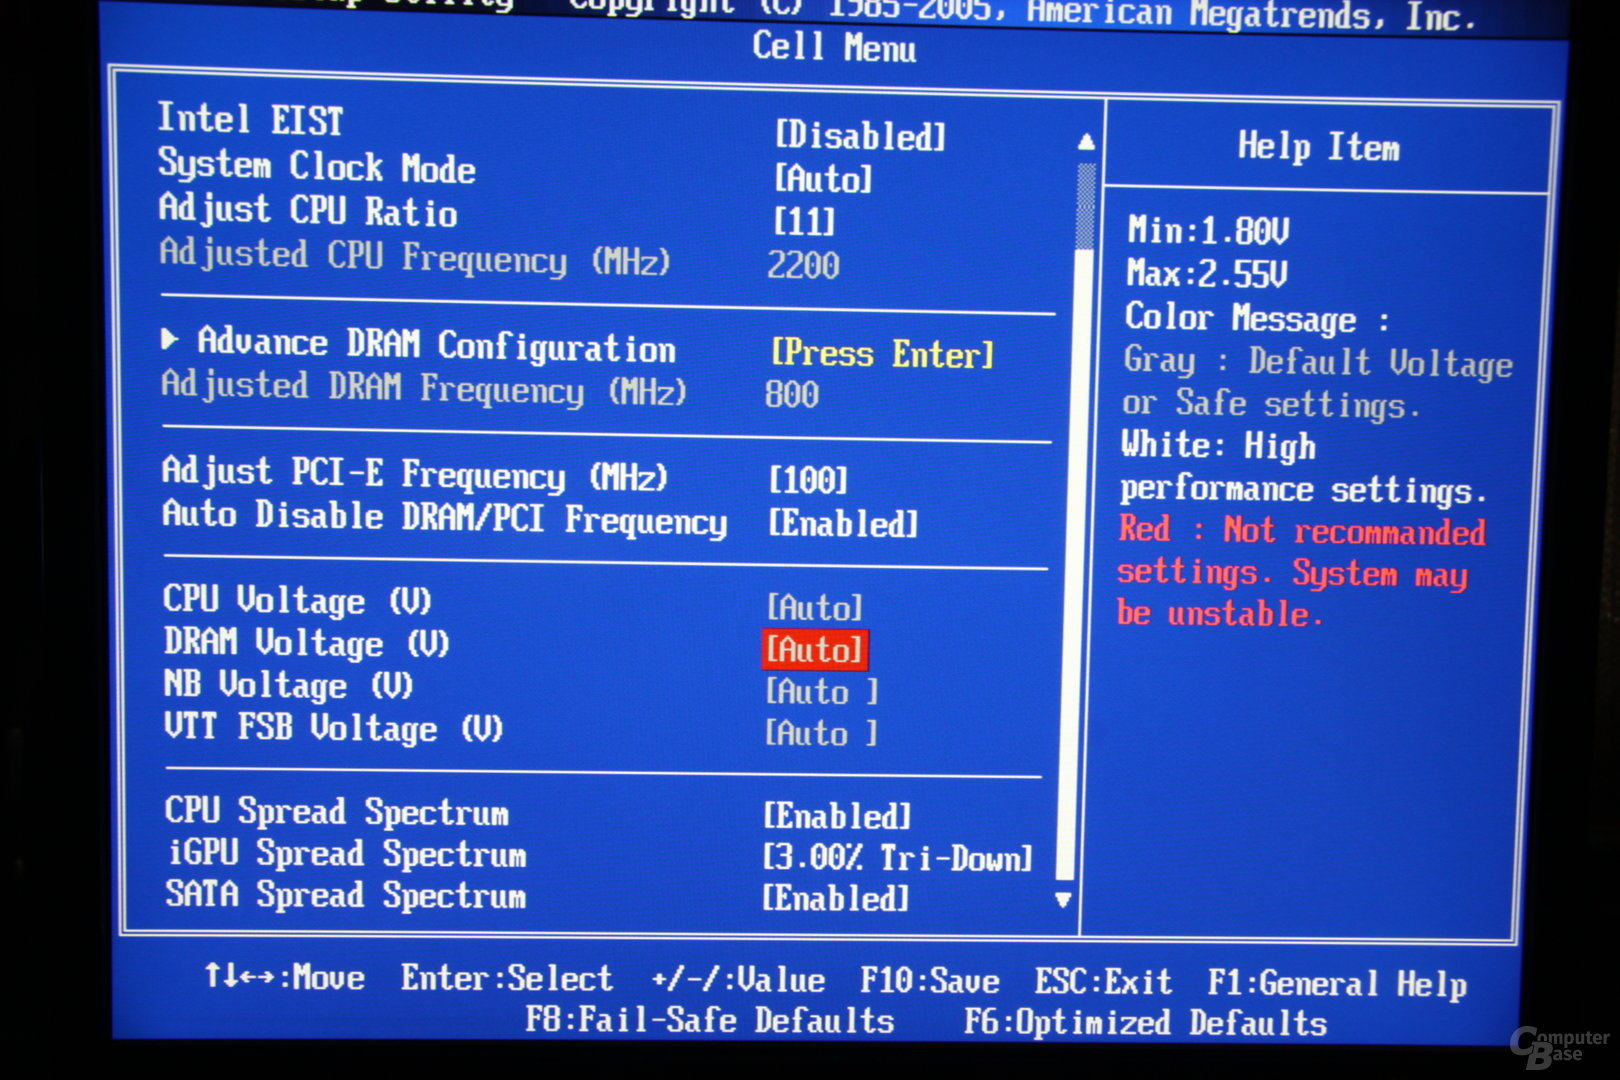 MSI P7NGM-Digital (GeForce 9300) BIOS